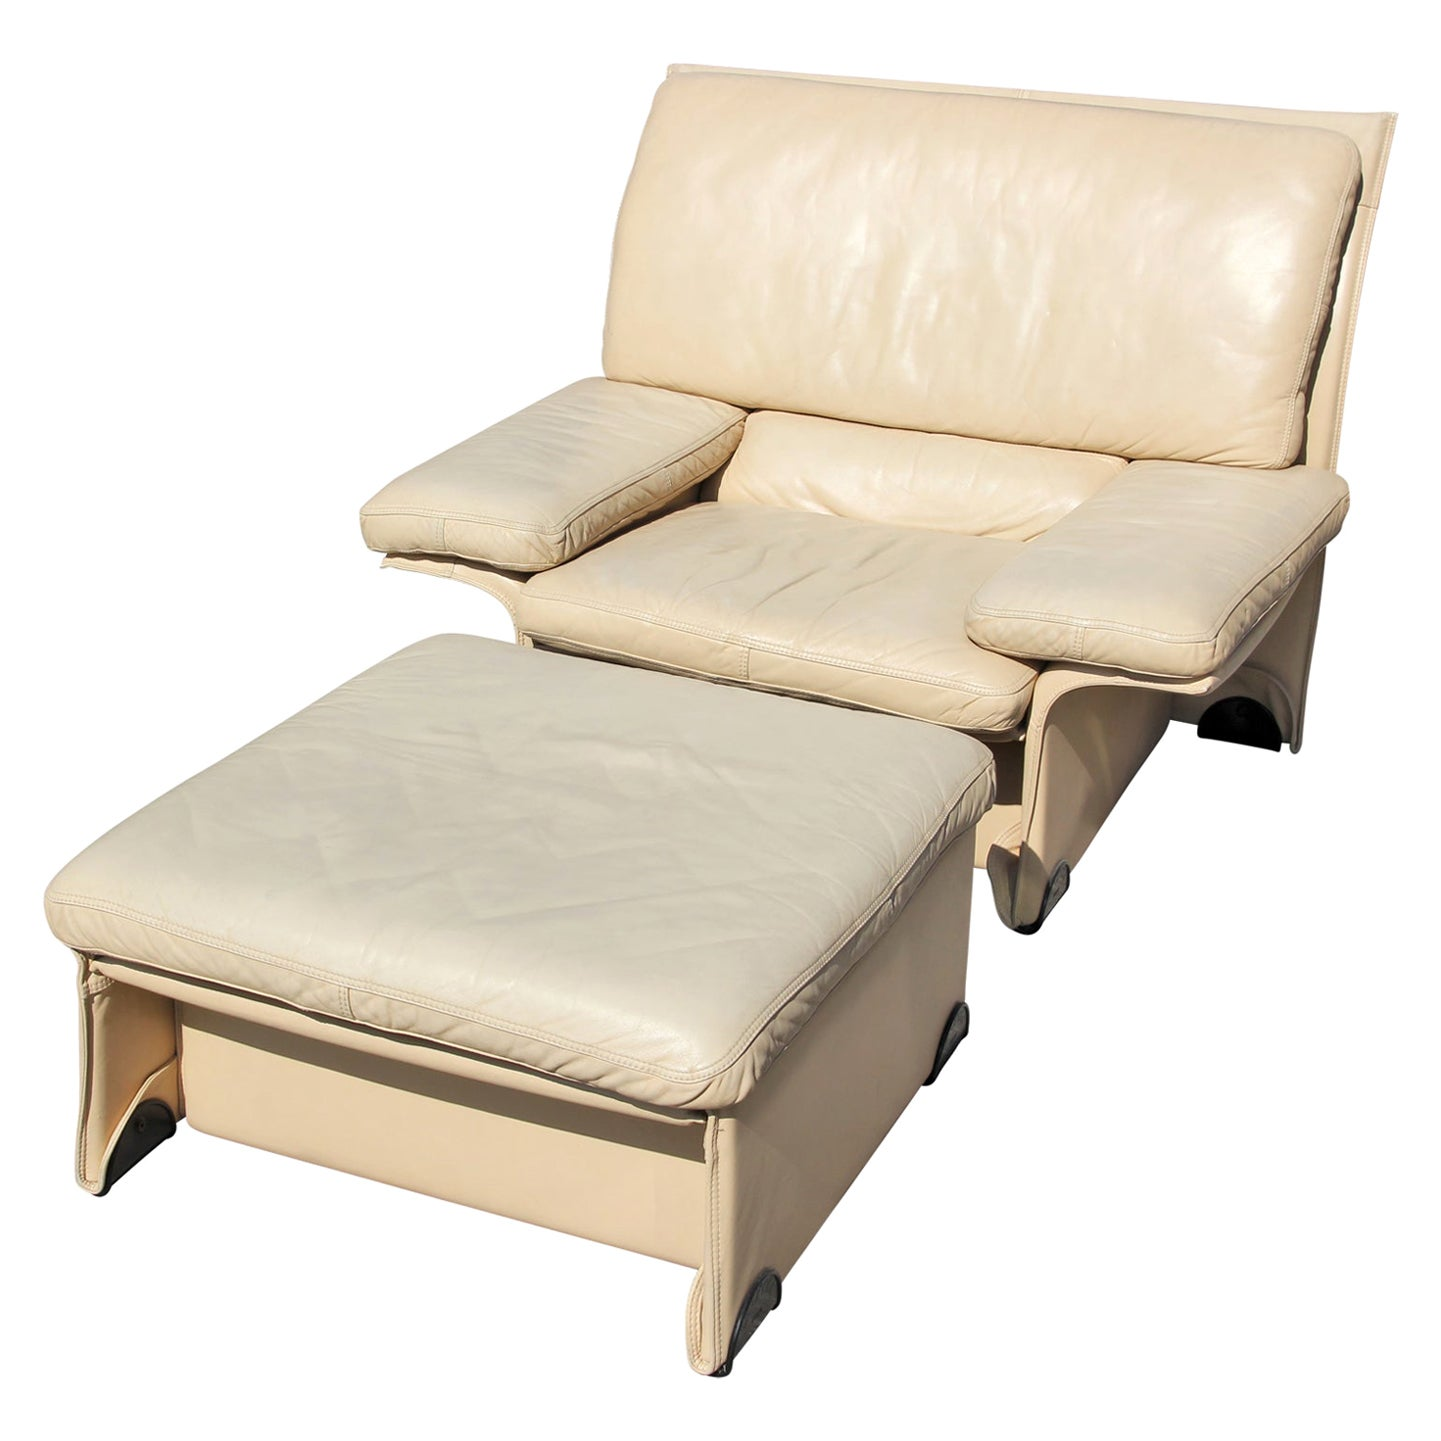 Brunati Postmodern Italian Cream Leather Lounge Chair and Ottoman